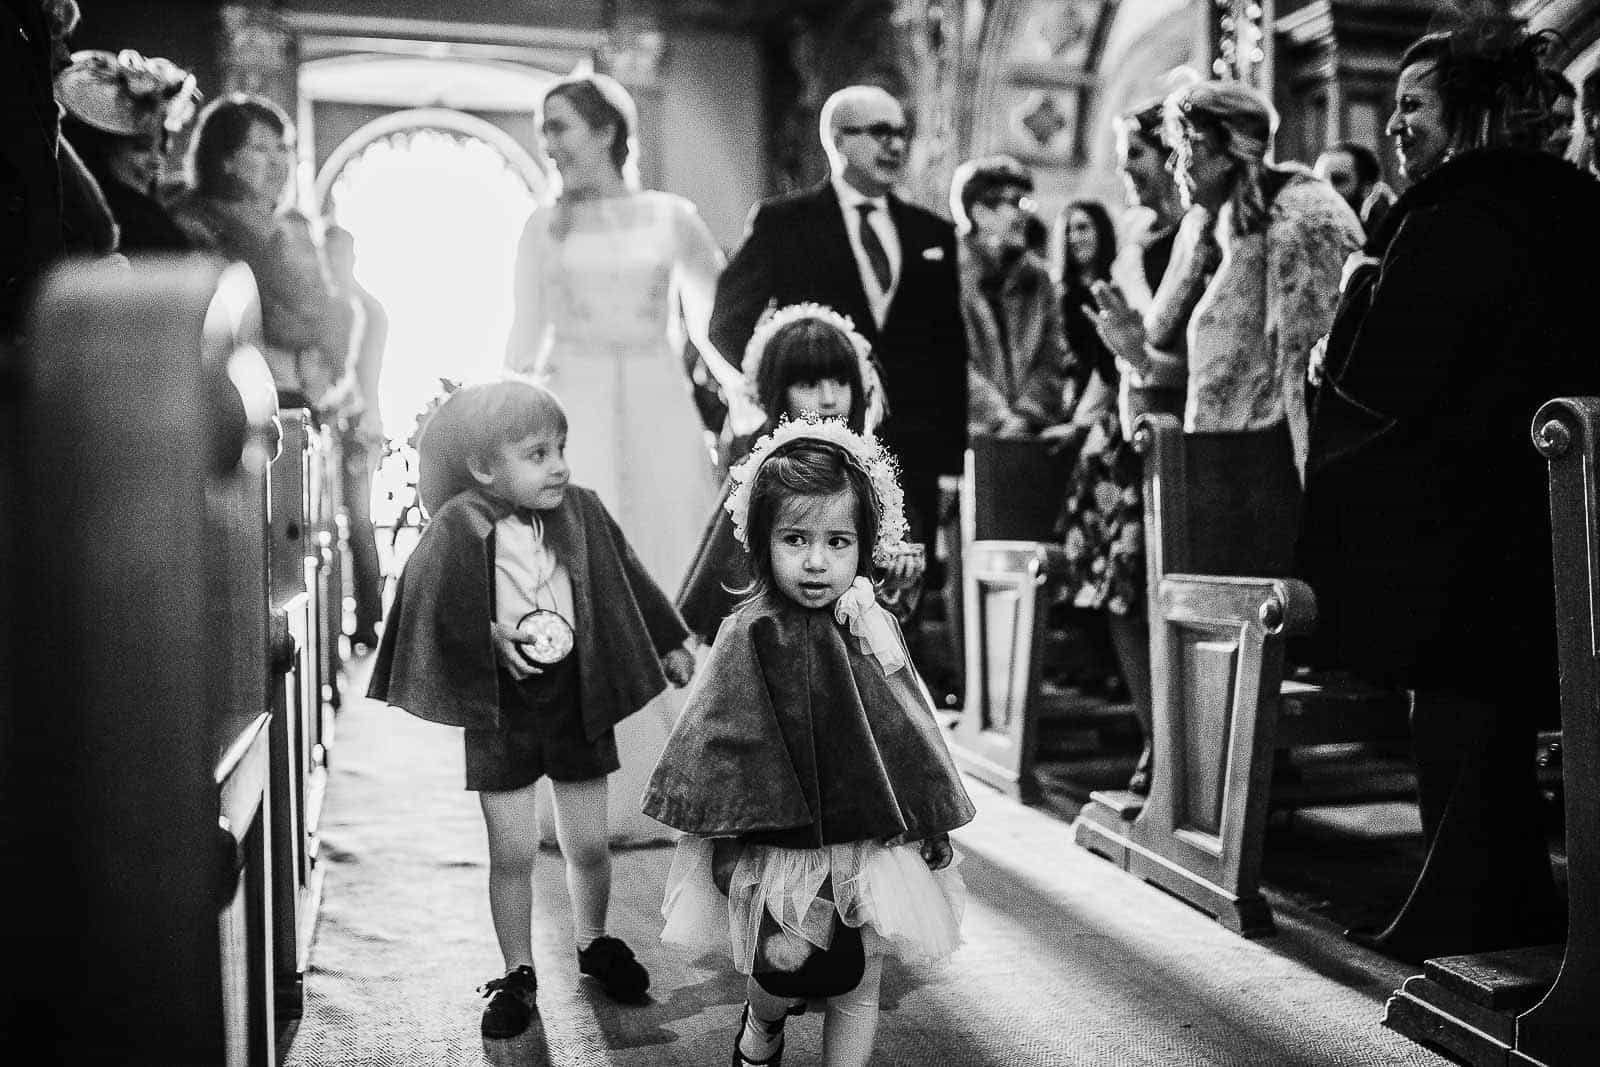 niños pajes blanco y negro pasillo santuario